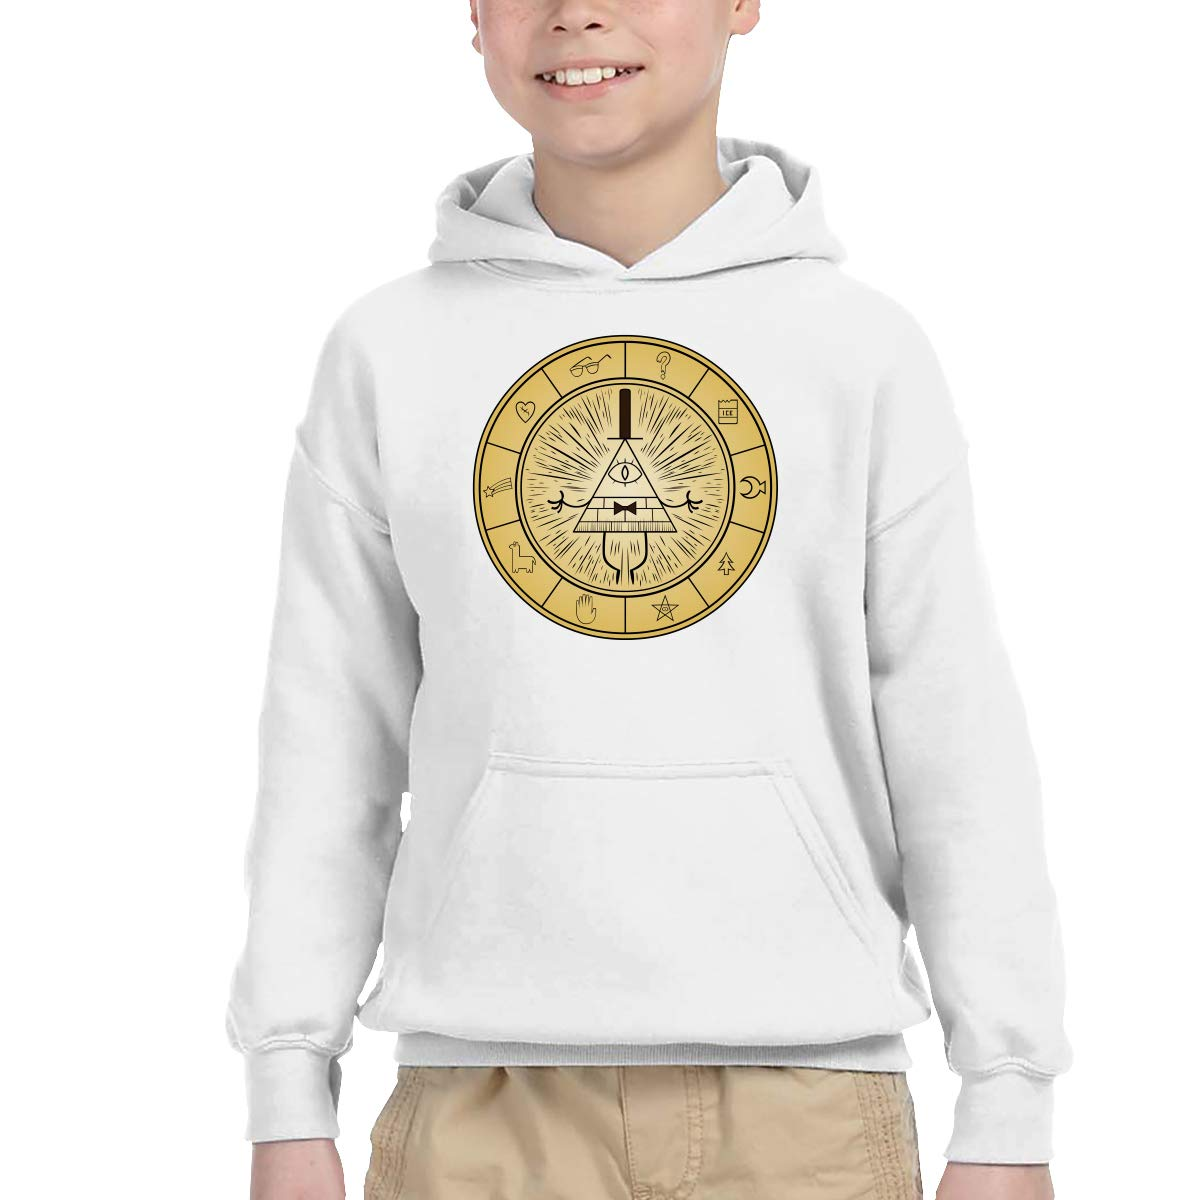 Gravity Falls Ped Hip Hop Pullover Hoodie Sweater with Kangaroo Pocket Hooded Sweatshirts